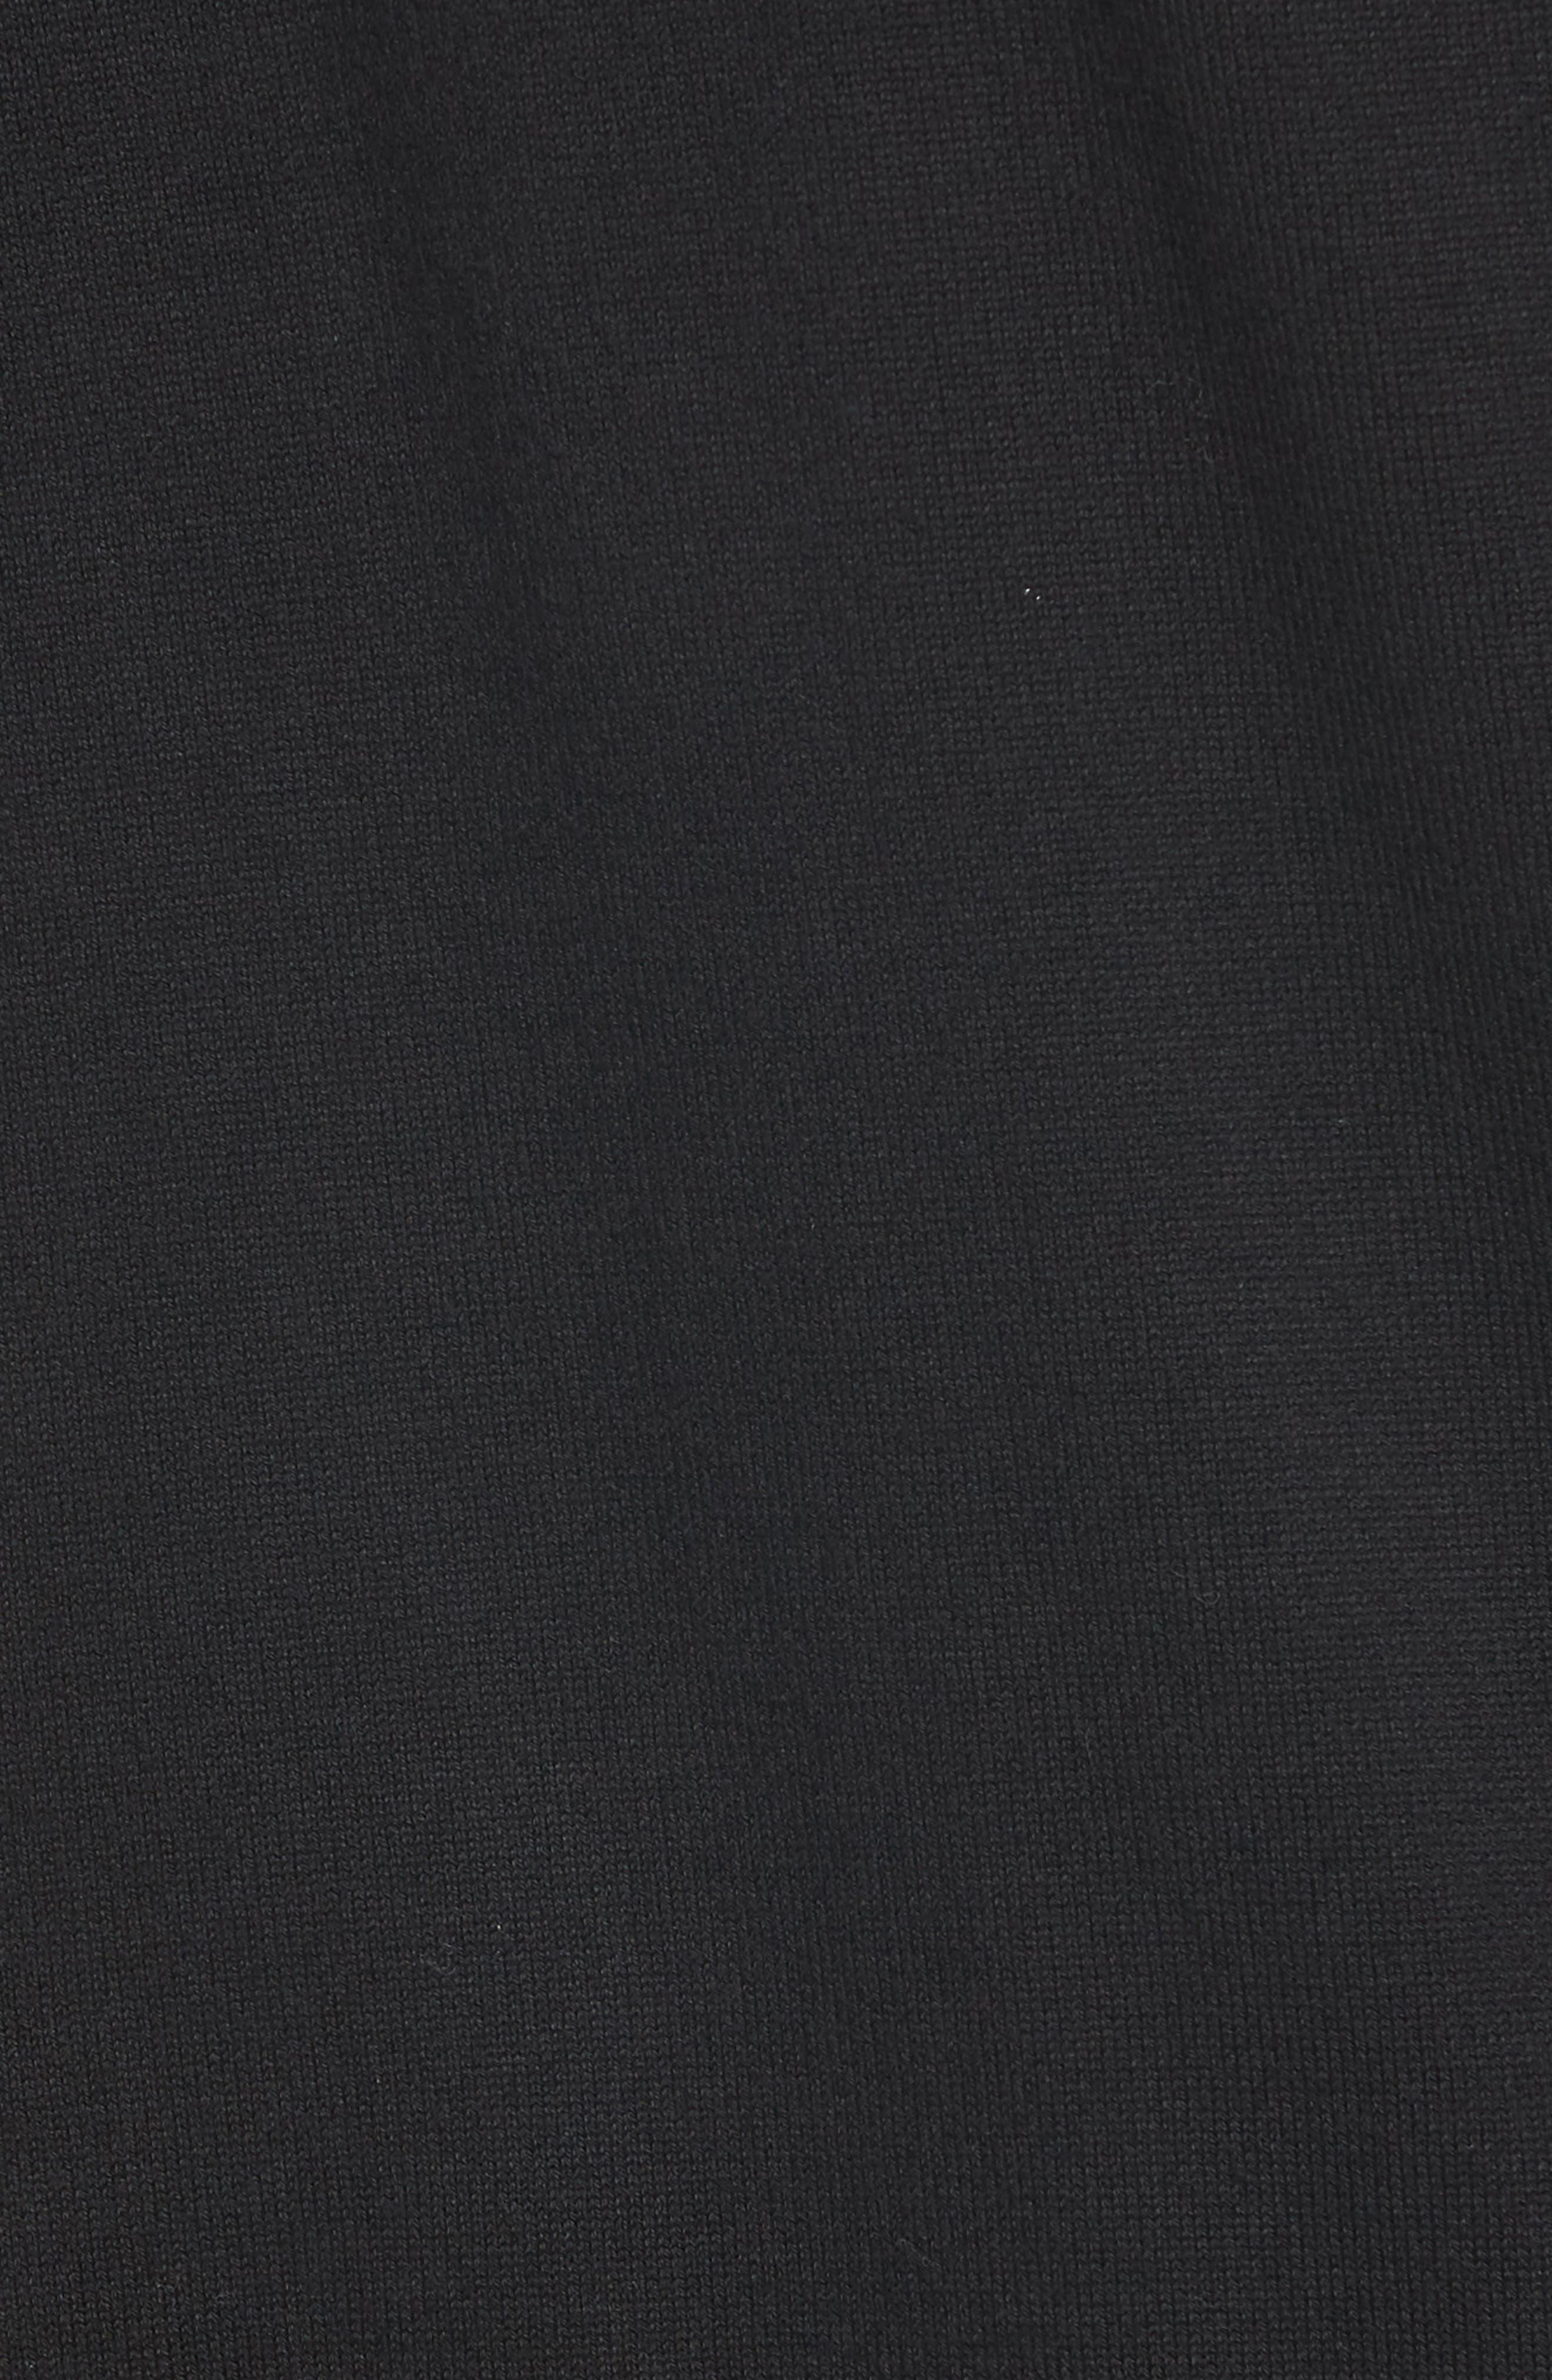 Atlanta Falcons - Lakemont Regular Fit Quarter Zip Sweater,                             Alternate thumbnail 5, color,                             BLACK